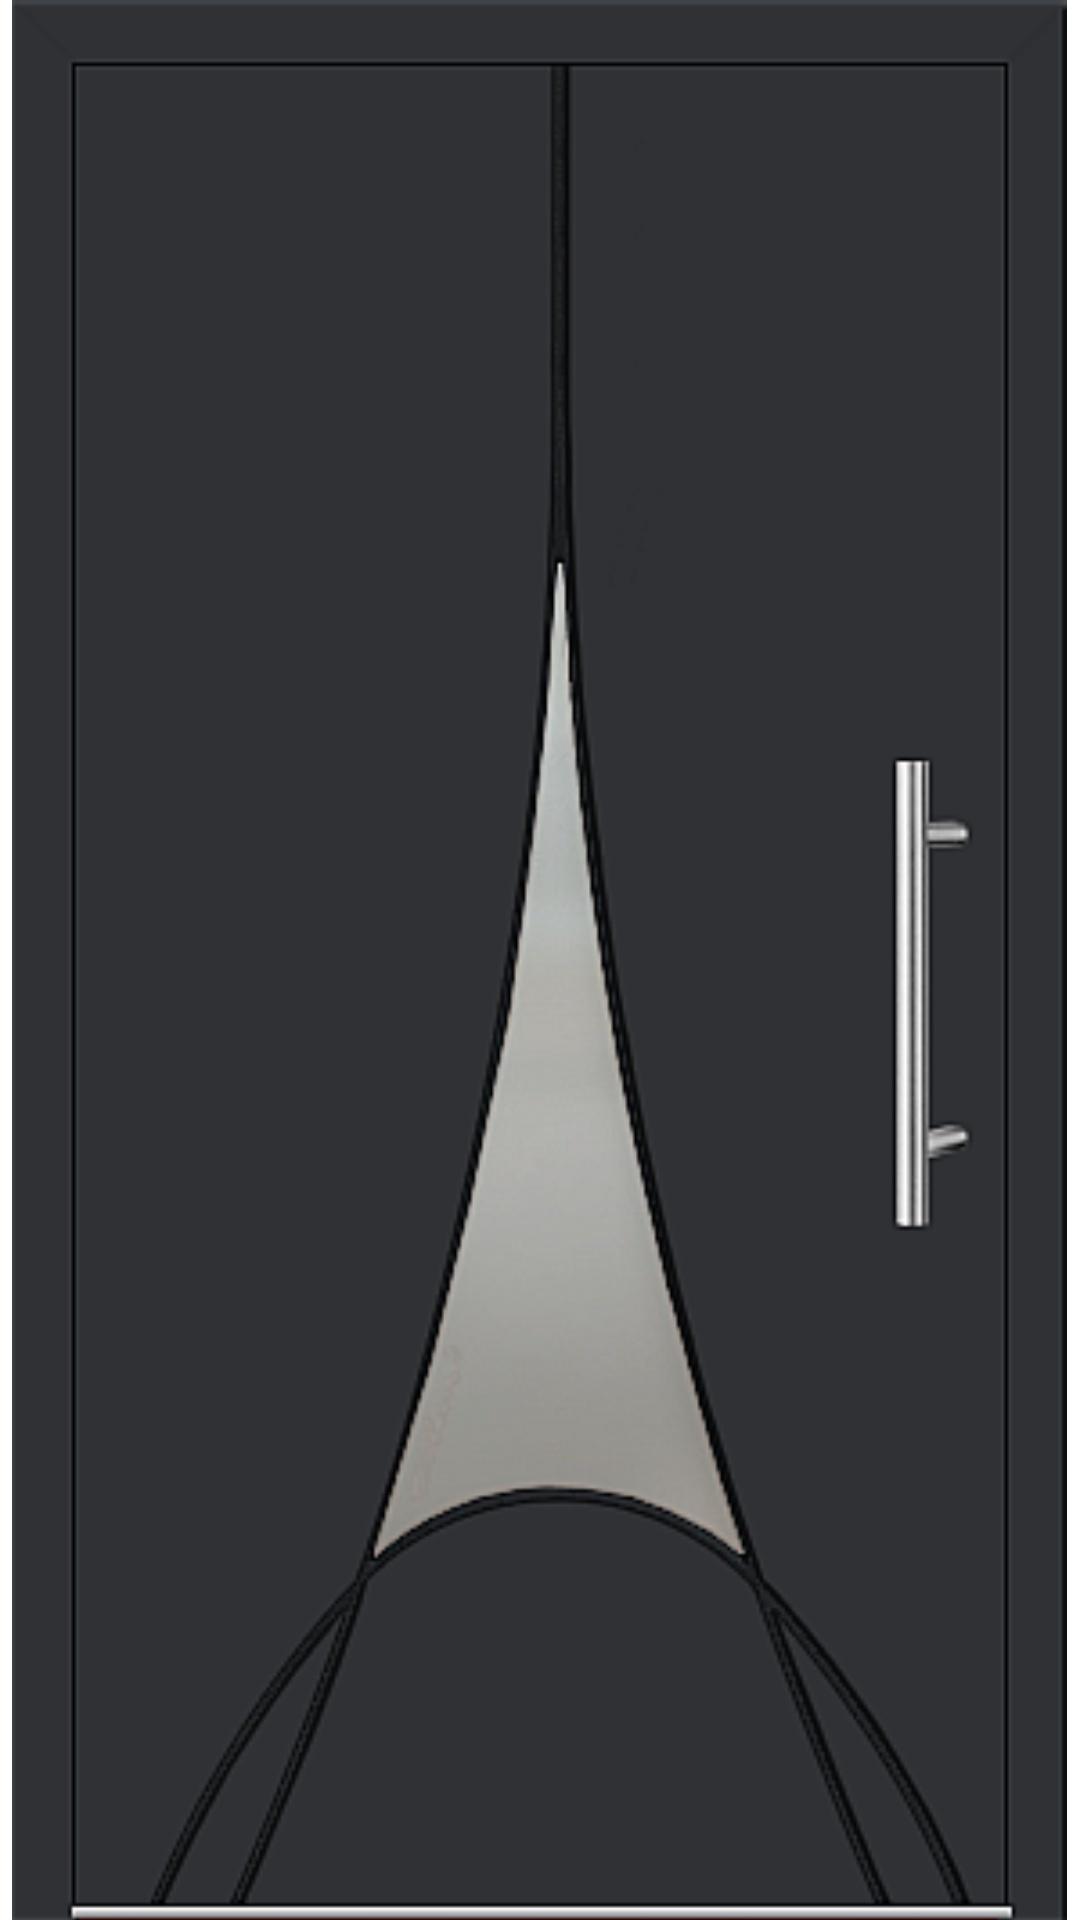 Aluminium Haustür Modell 6997-41 schwarz